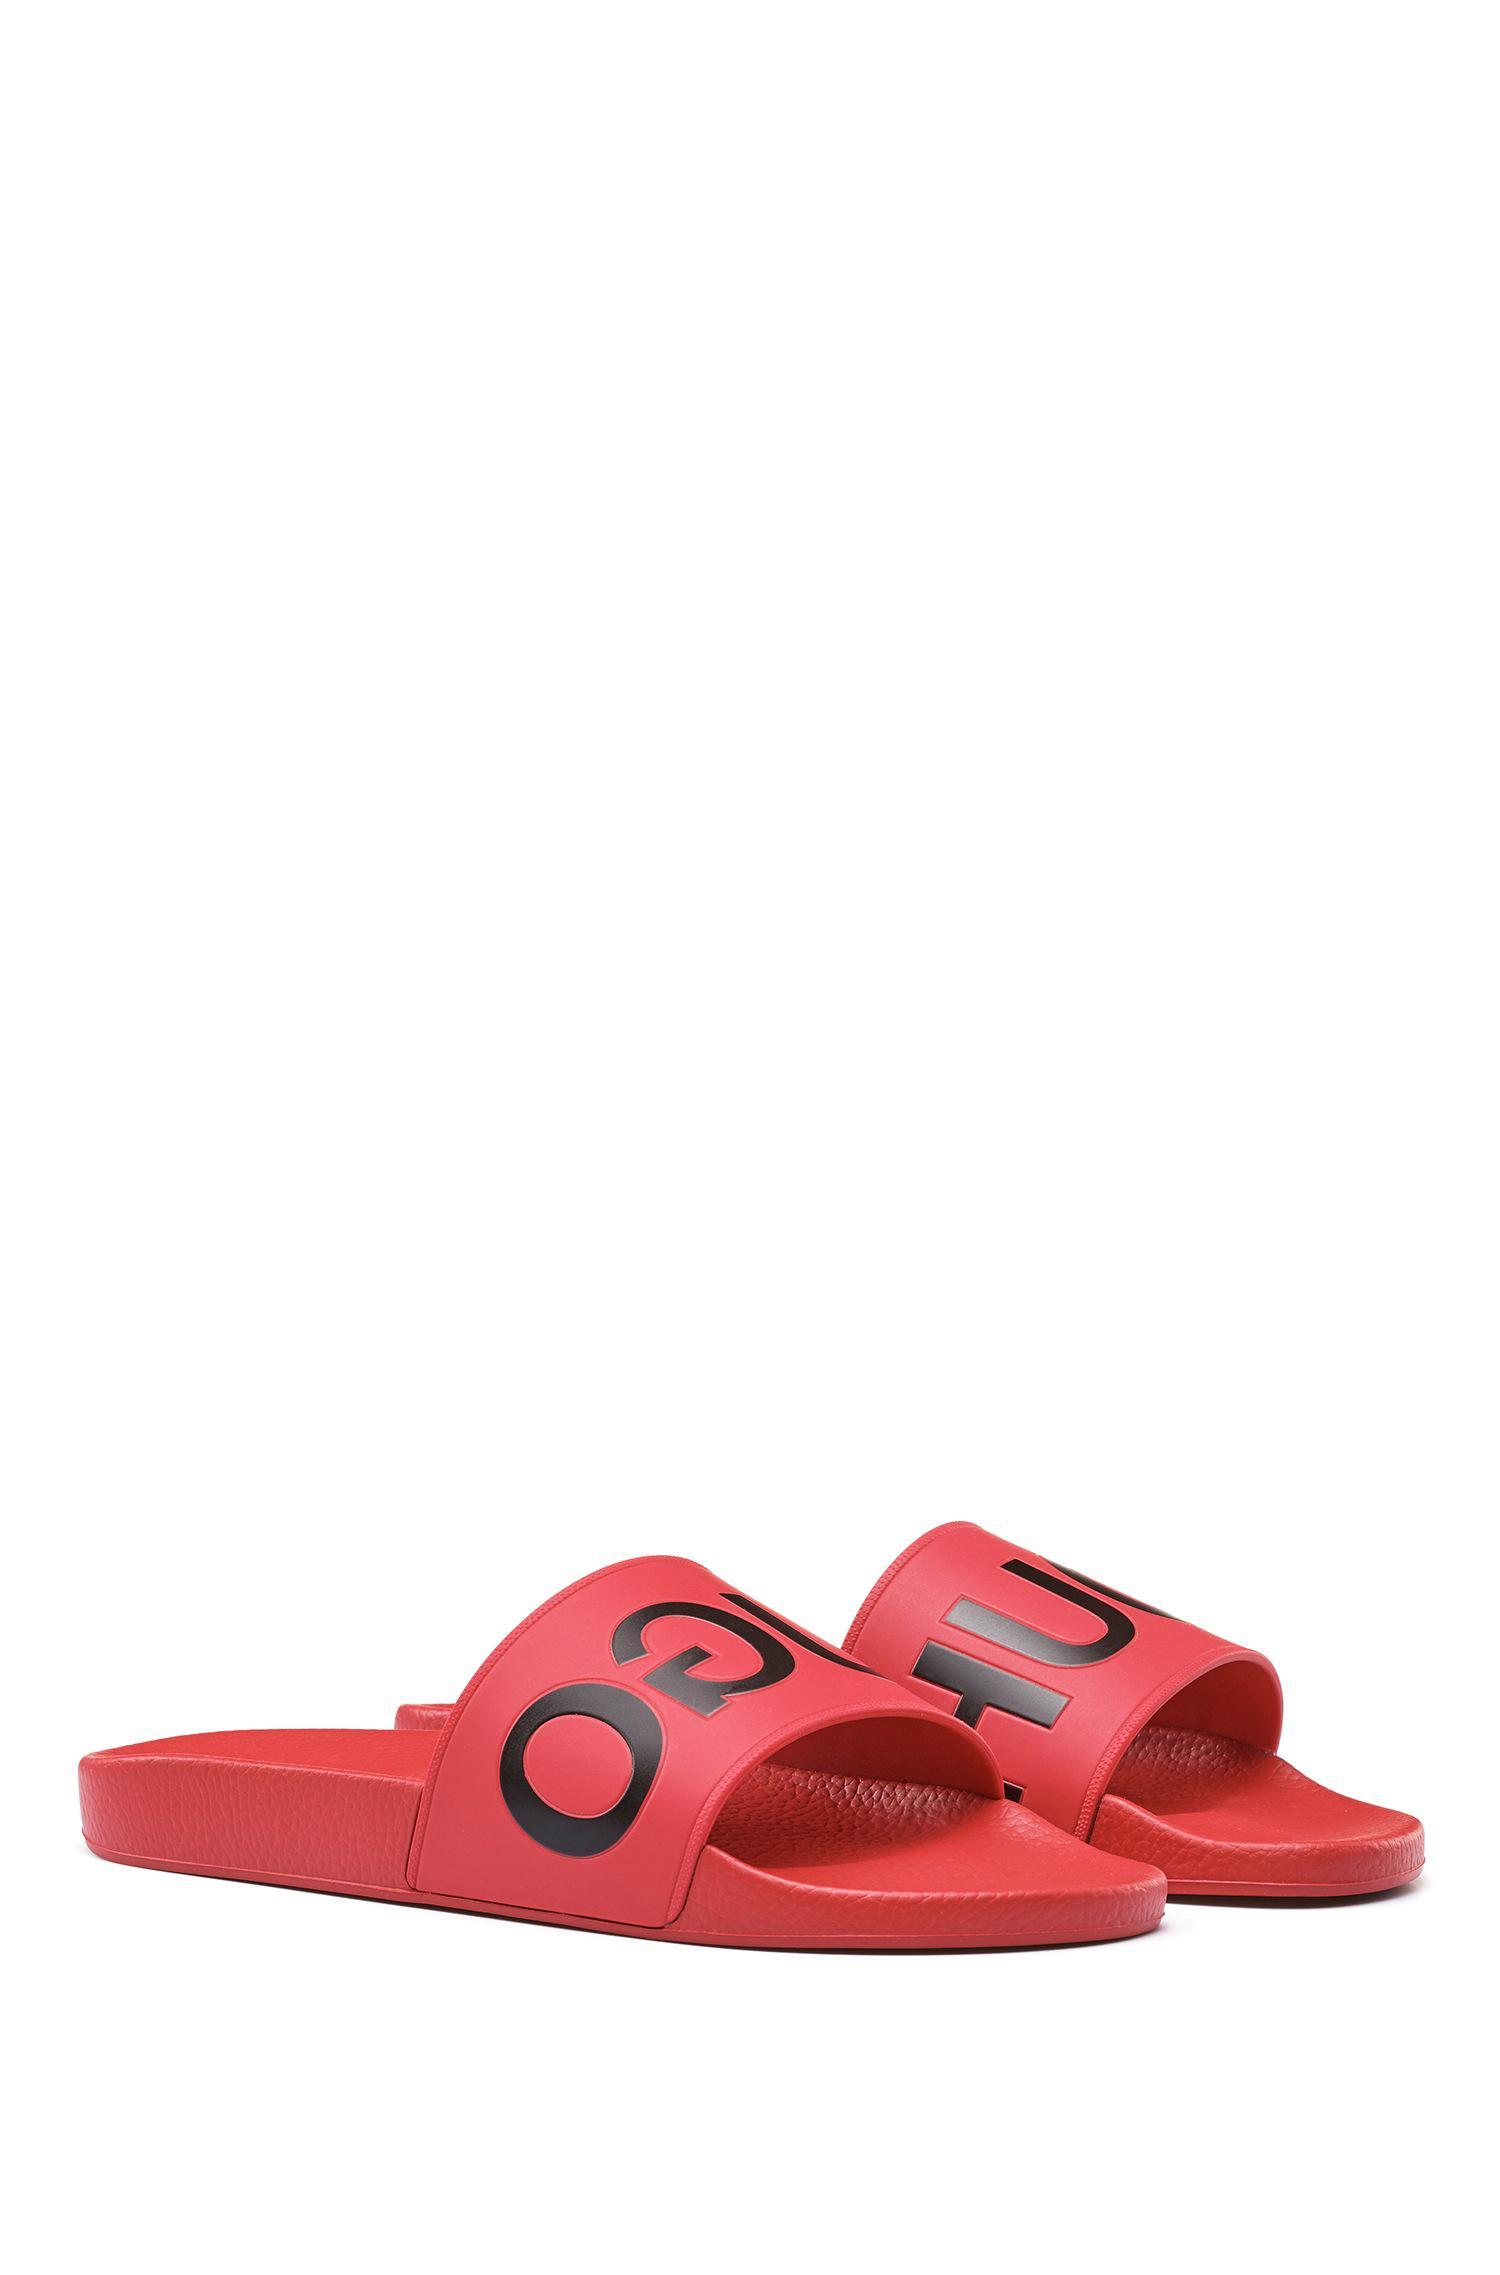 9b6f37640a04 Lyst - HUGO Reverse Logo Sliders In Red in Red for Men